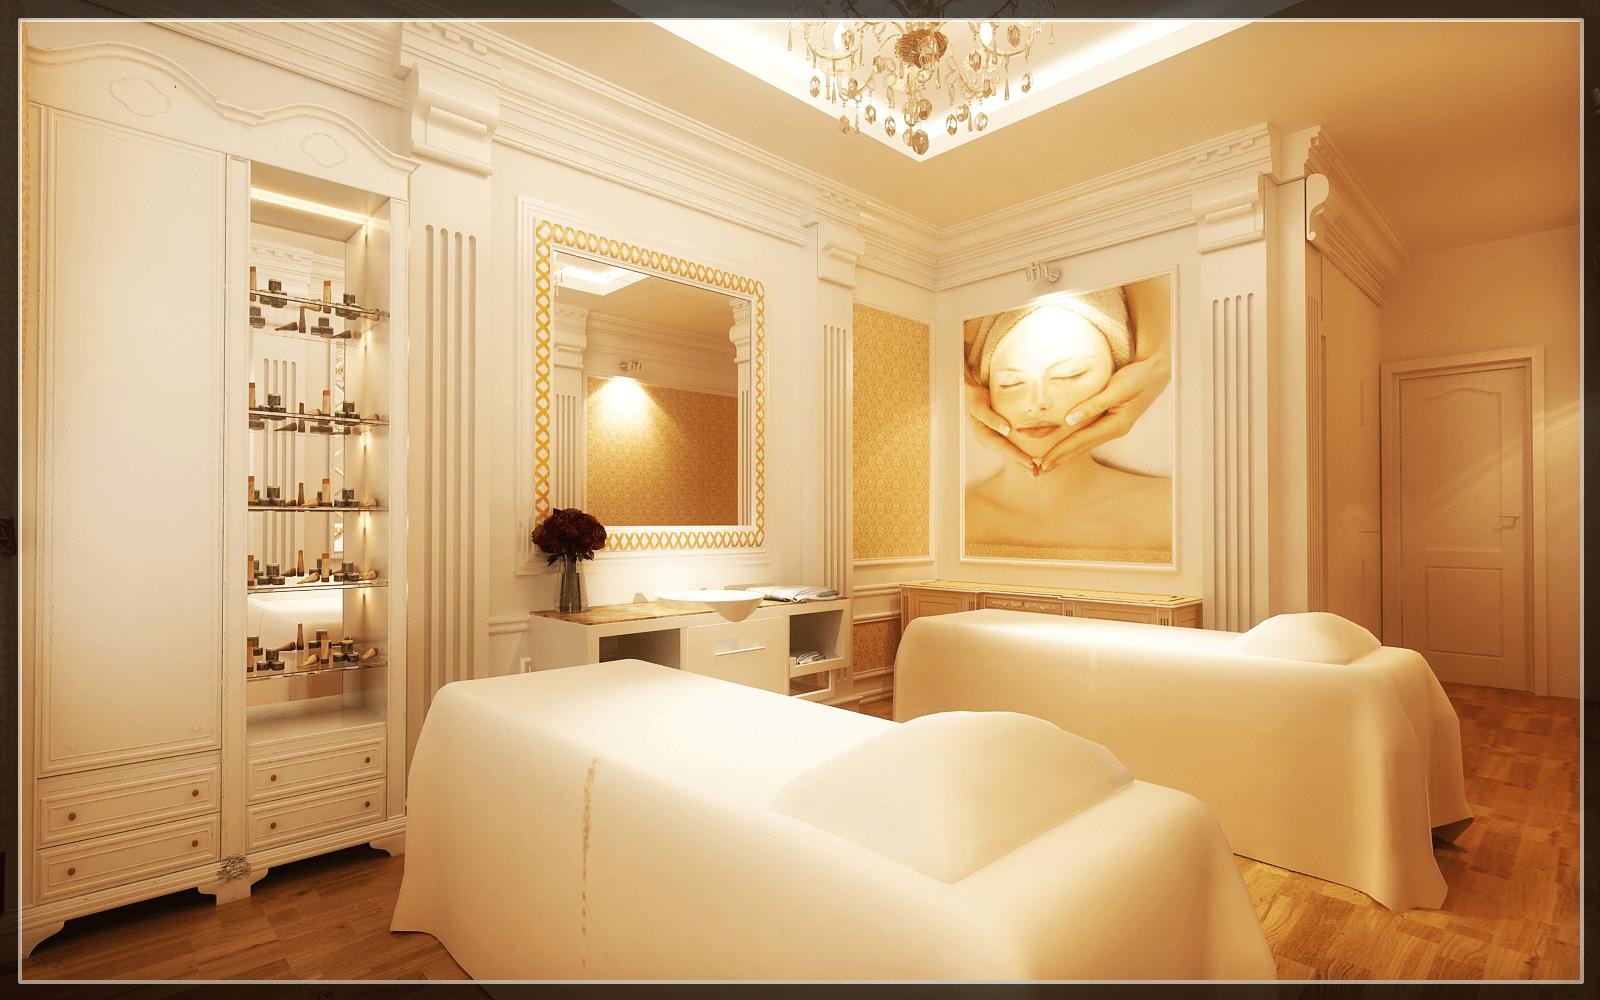 thiet-ke-noi-thay-spa-phong-massage